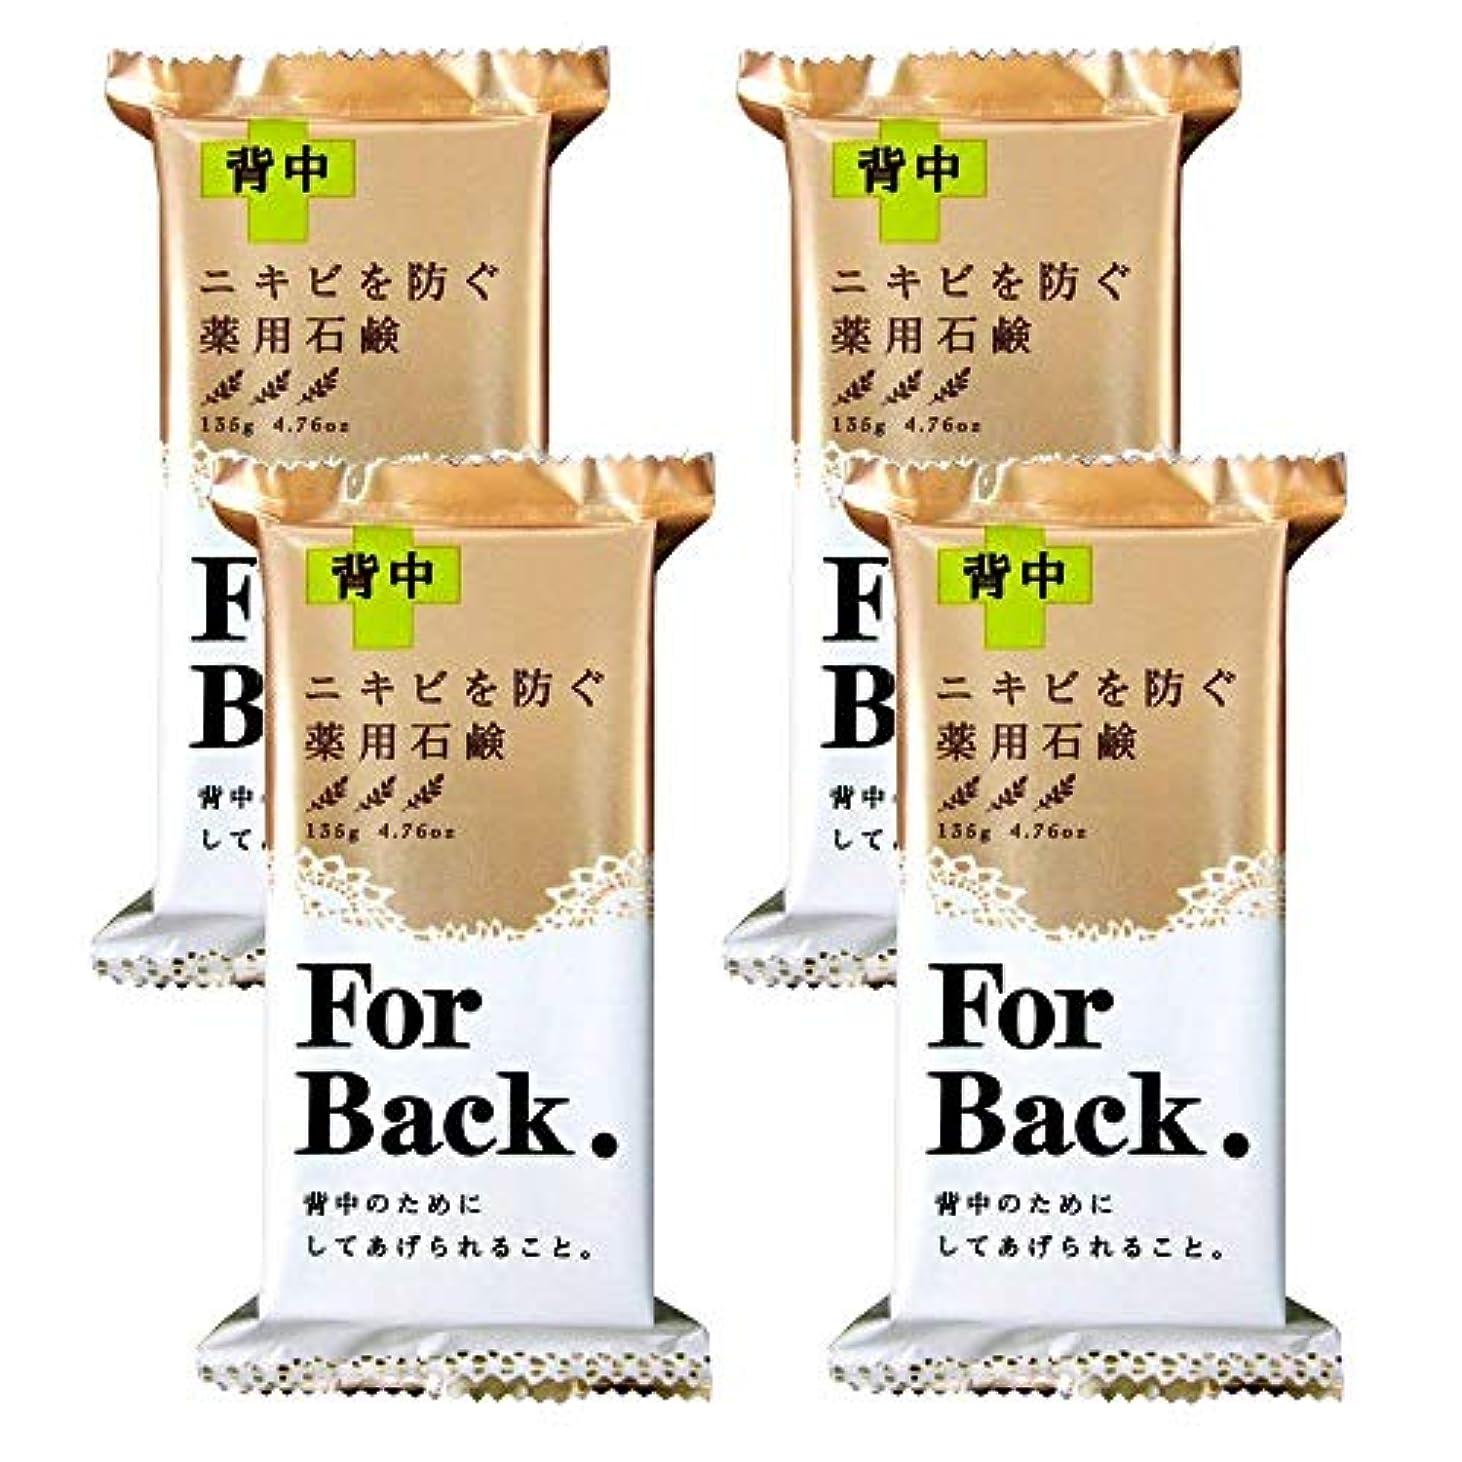 軽人工有効化薬用石鹸 ForBack 135g×4個セット